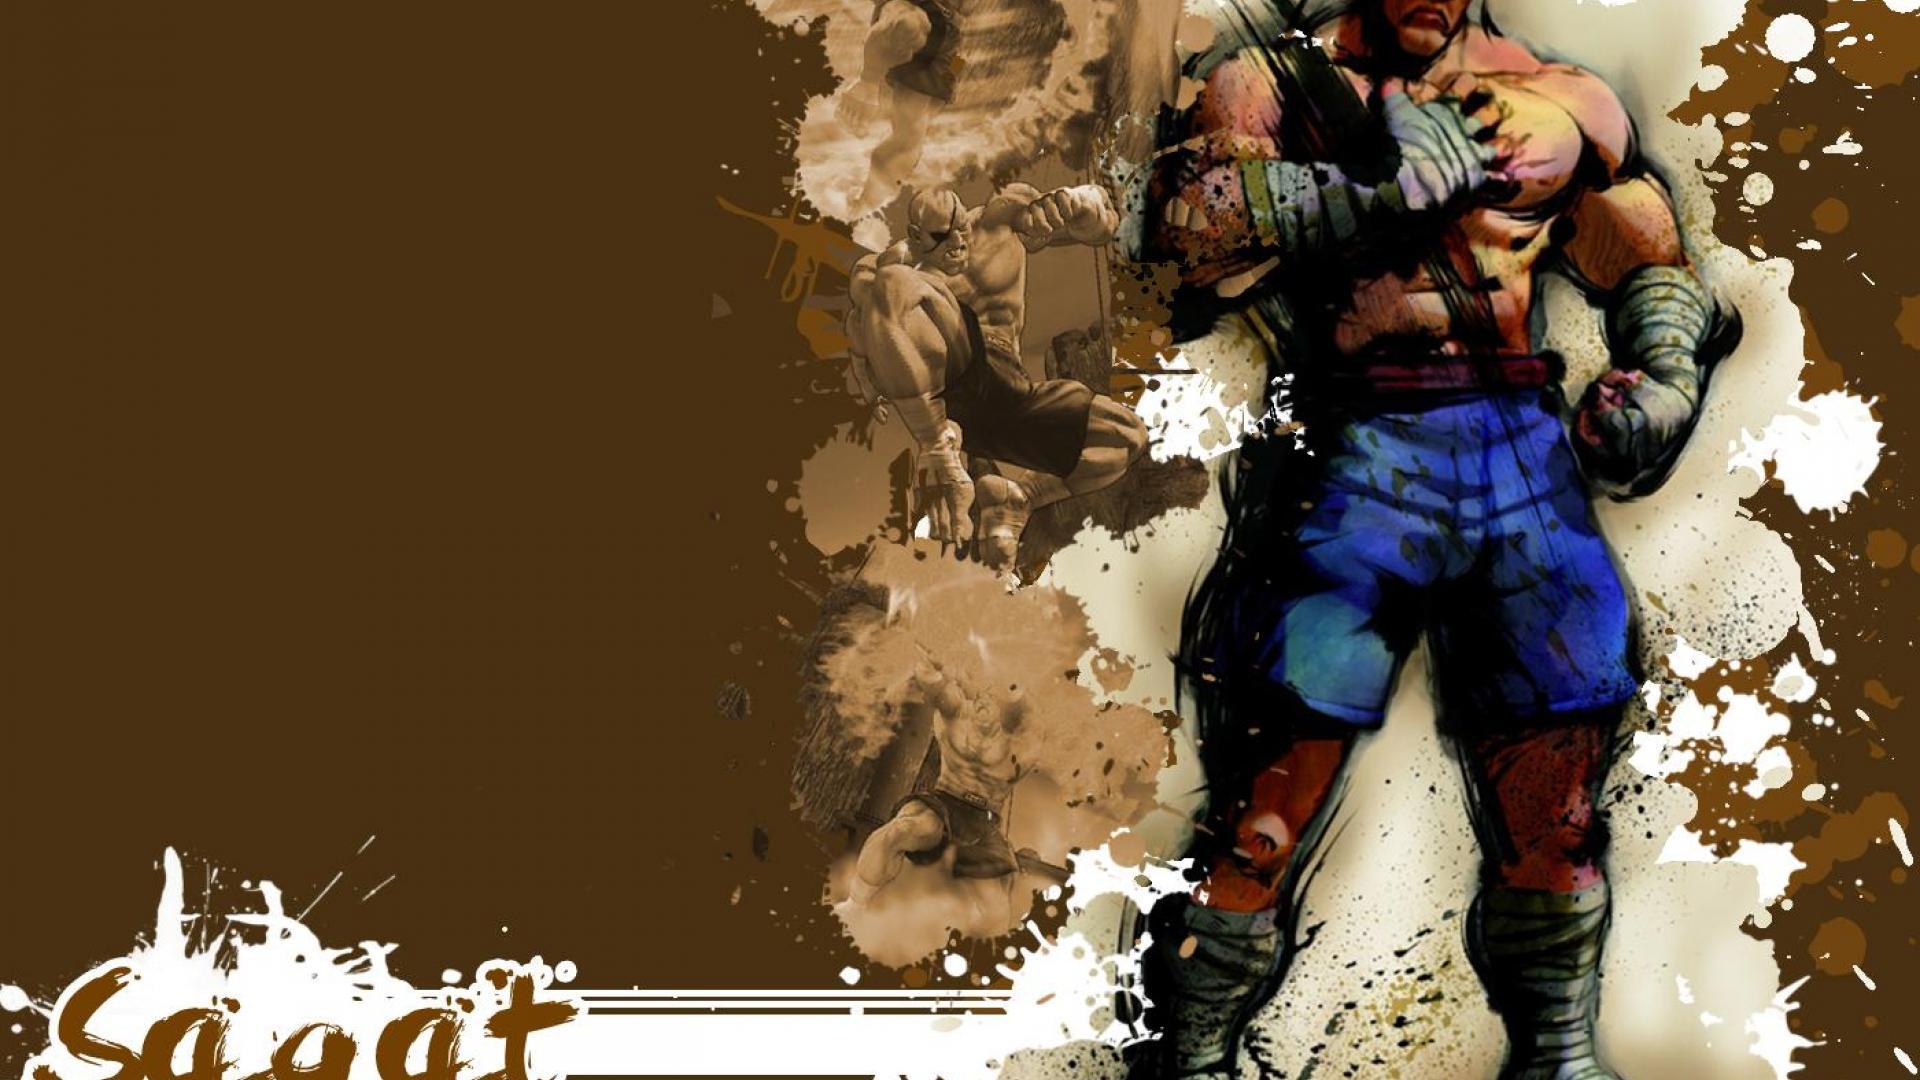 Street fighter HD Wallpapers, Desktop Backgrounds, Mobile